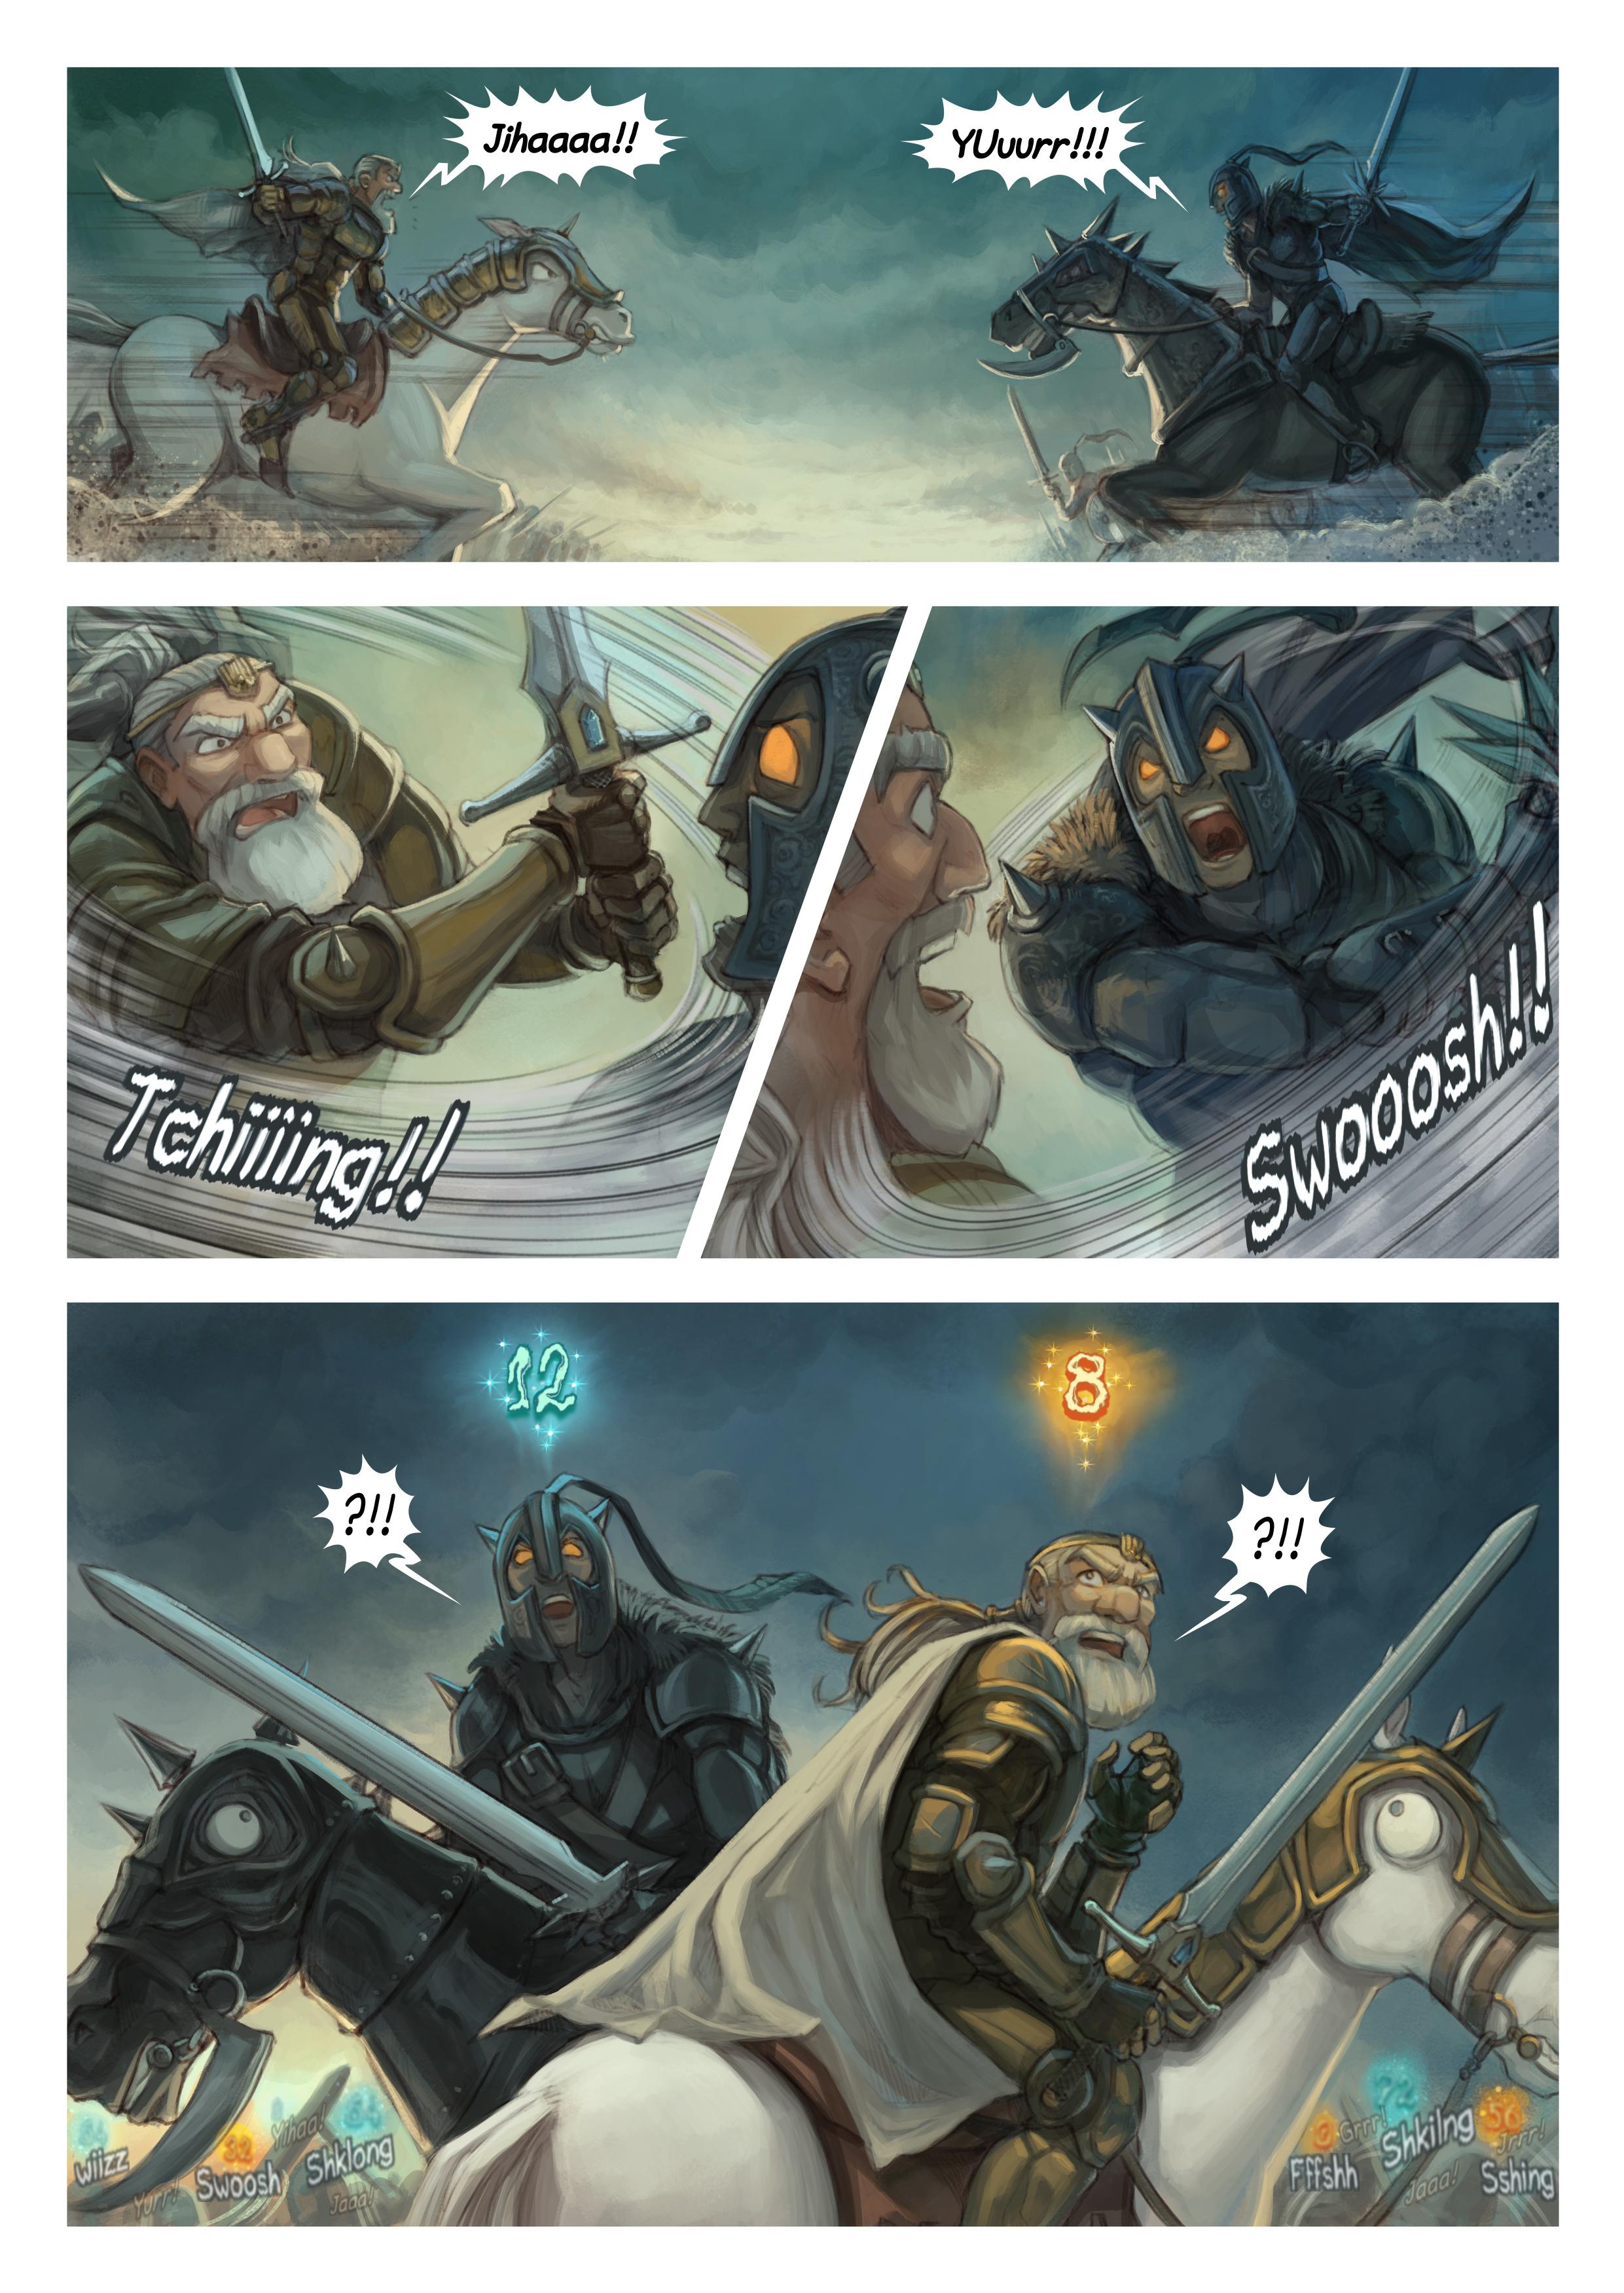 Episode 33: Krigs-trylleformularen, Page 5